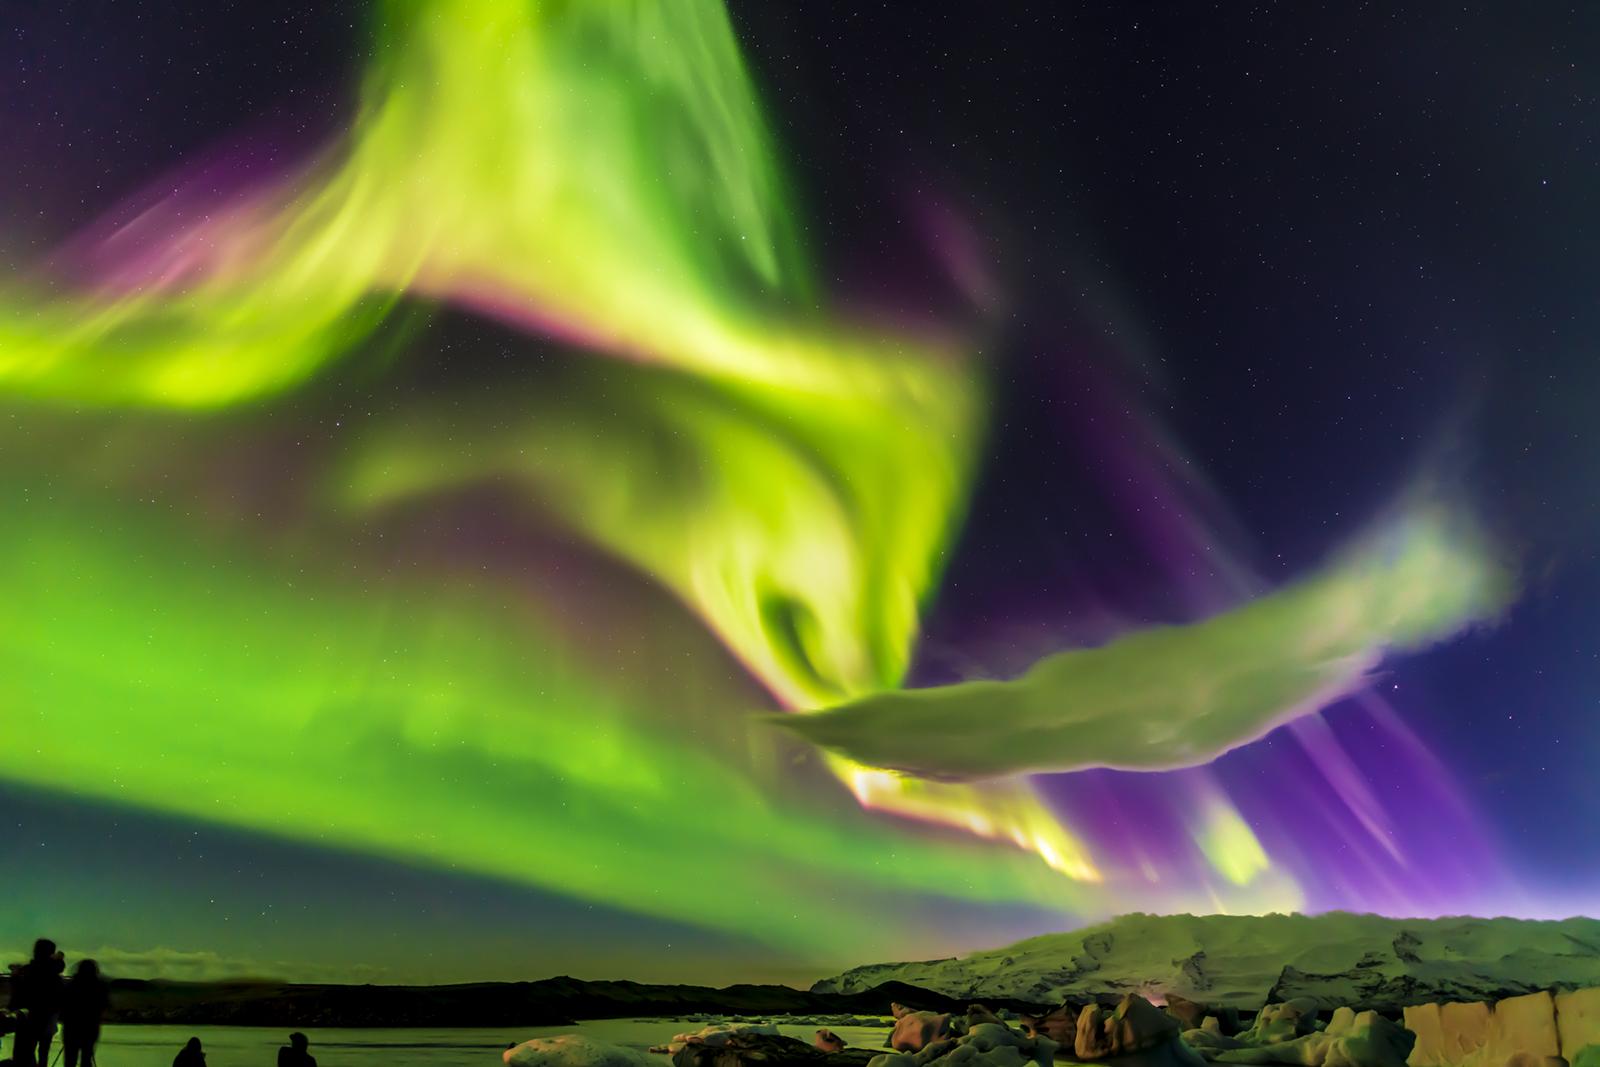 Aurora Borealis captured in Jokulsarlon, Iceland by Robert Rotella